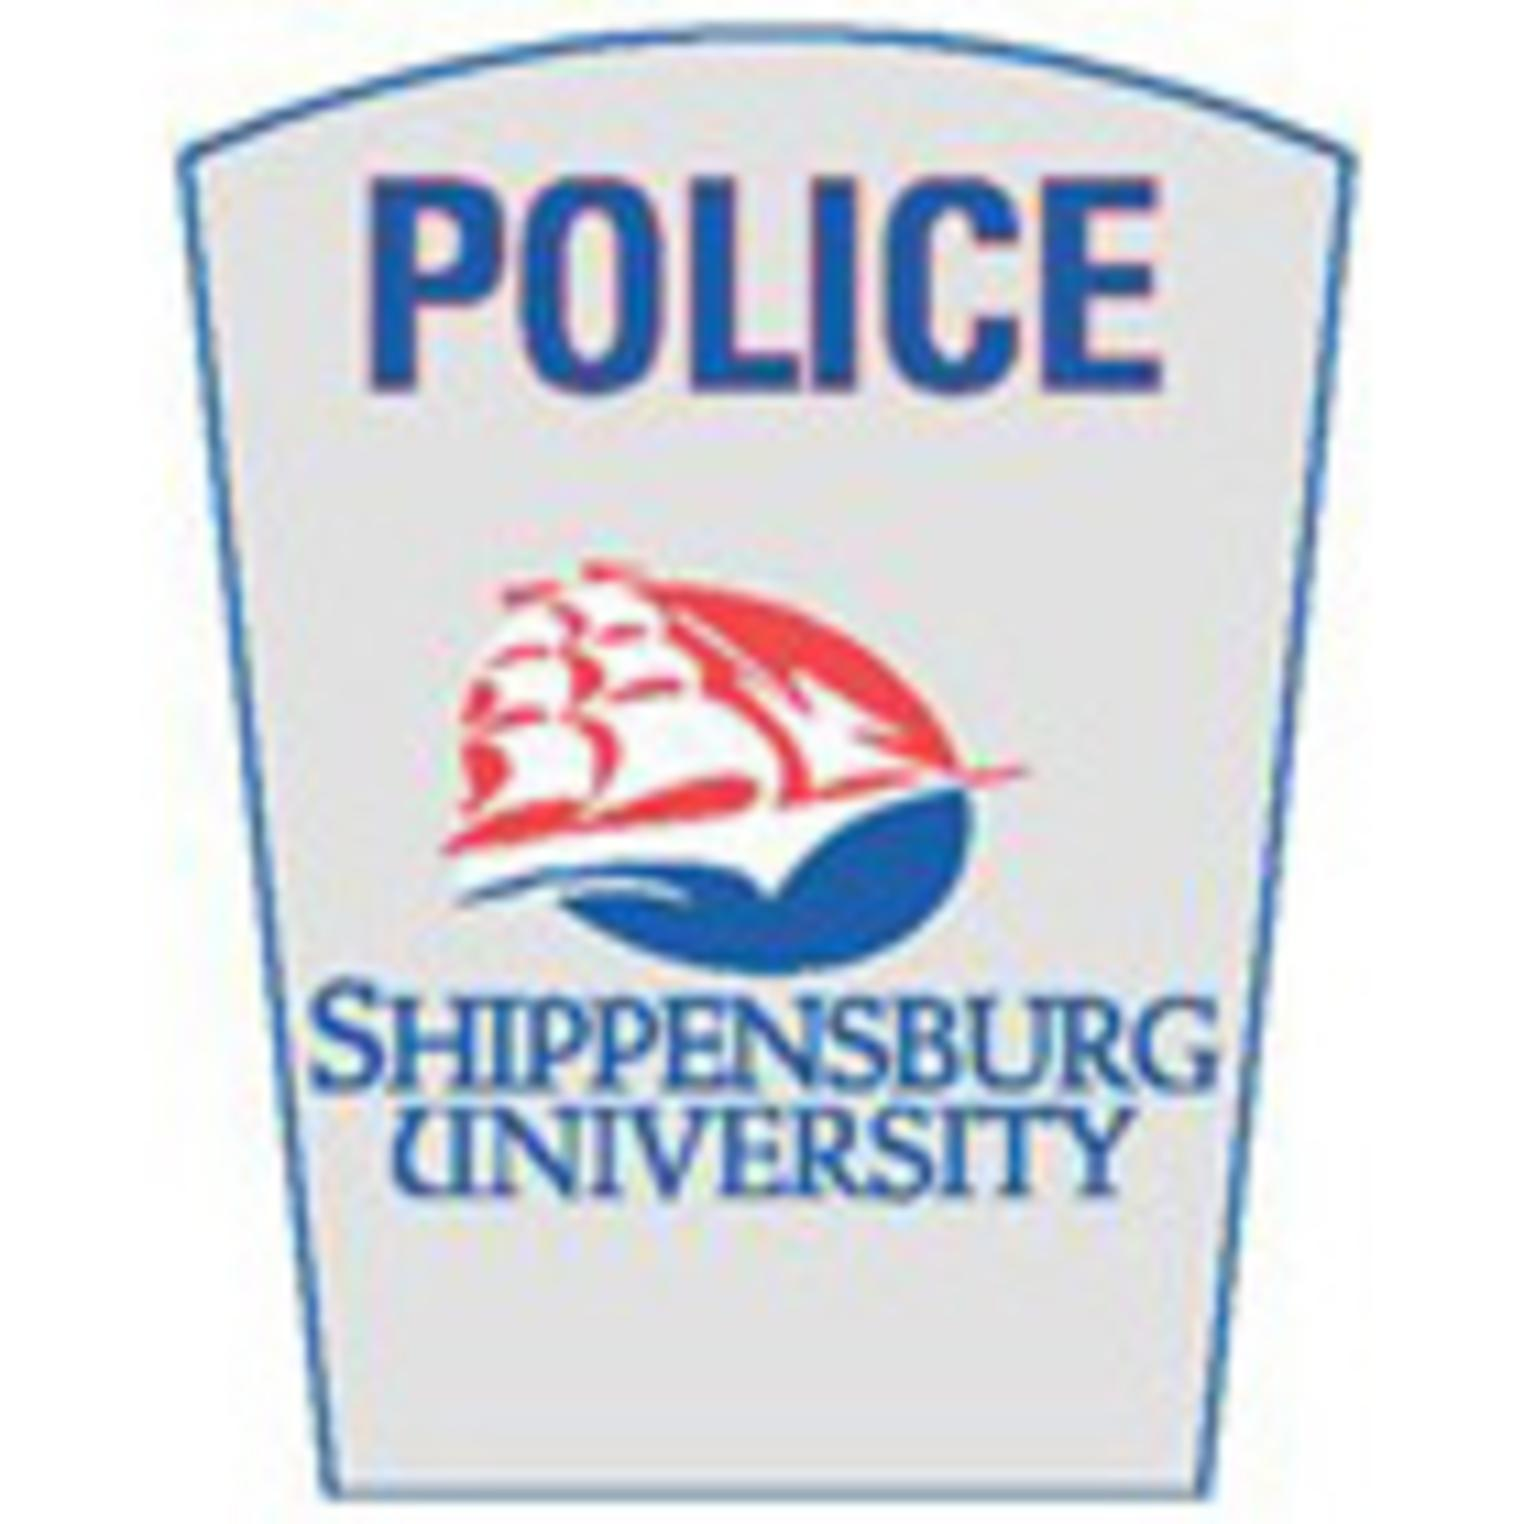 Shippensburg University Police